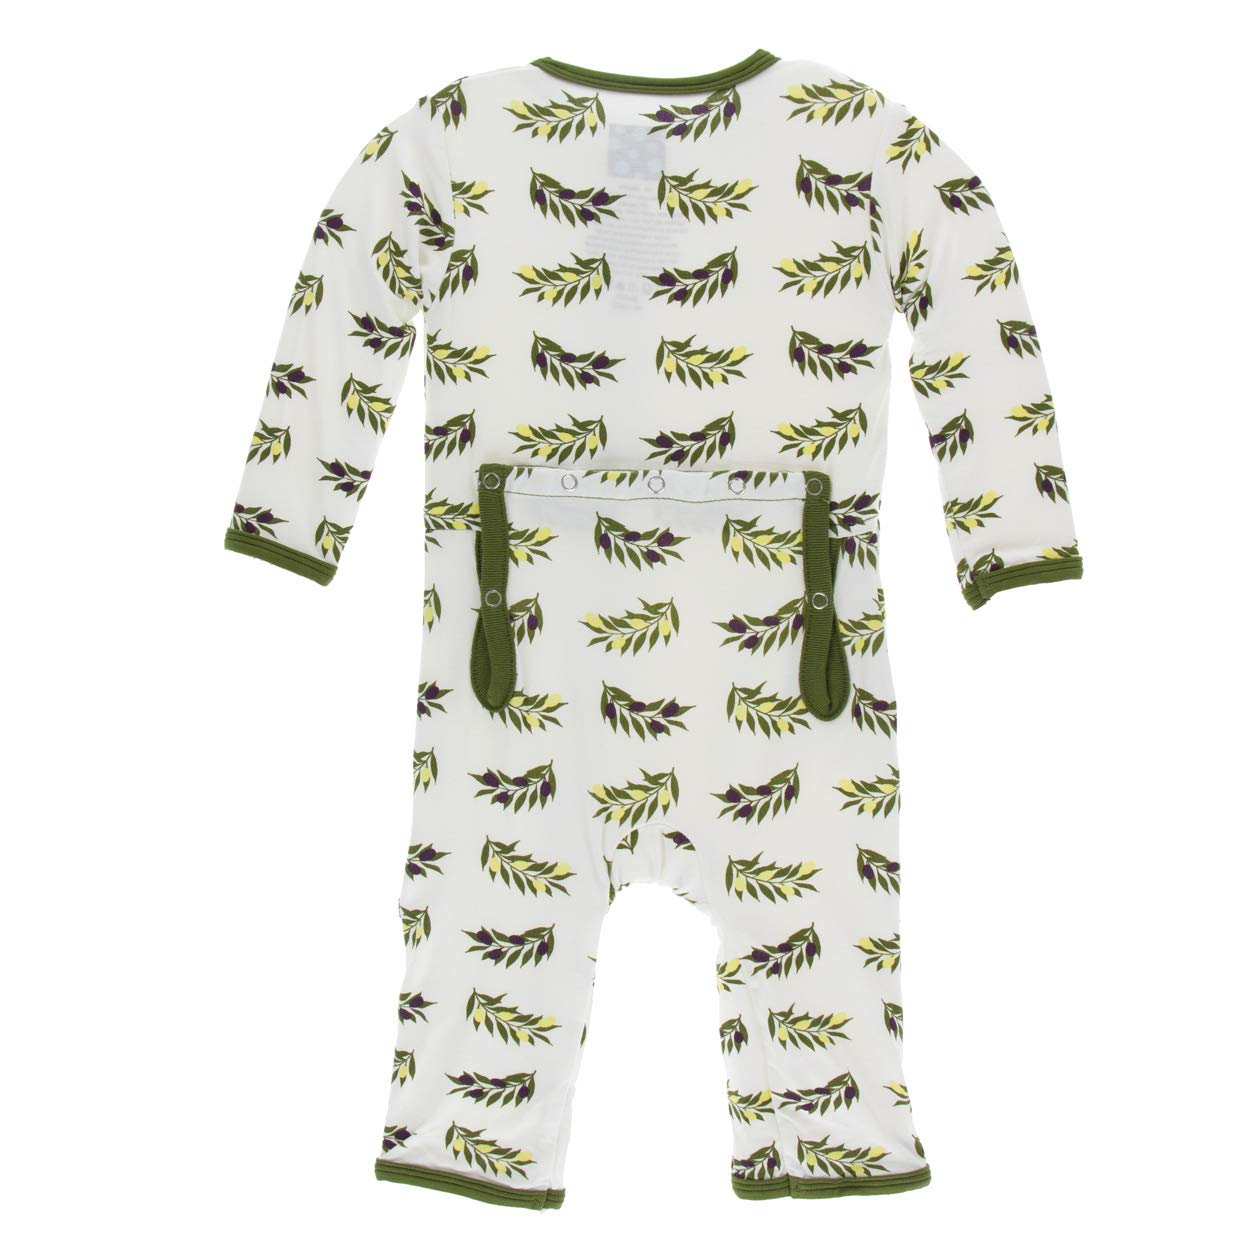 Kickee Pants Bamboo Coverall Zipper PRD-KPZCA394F17D